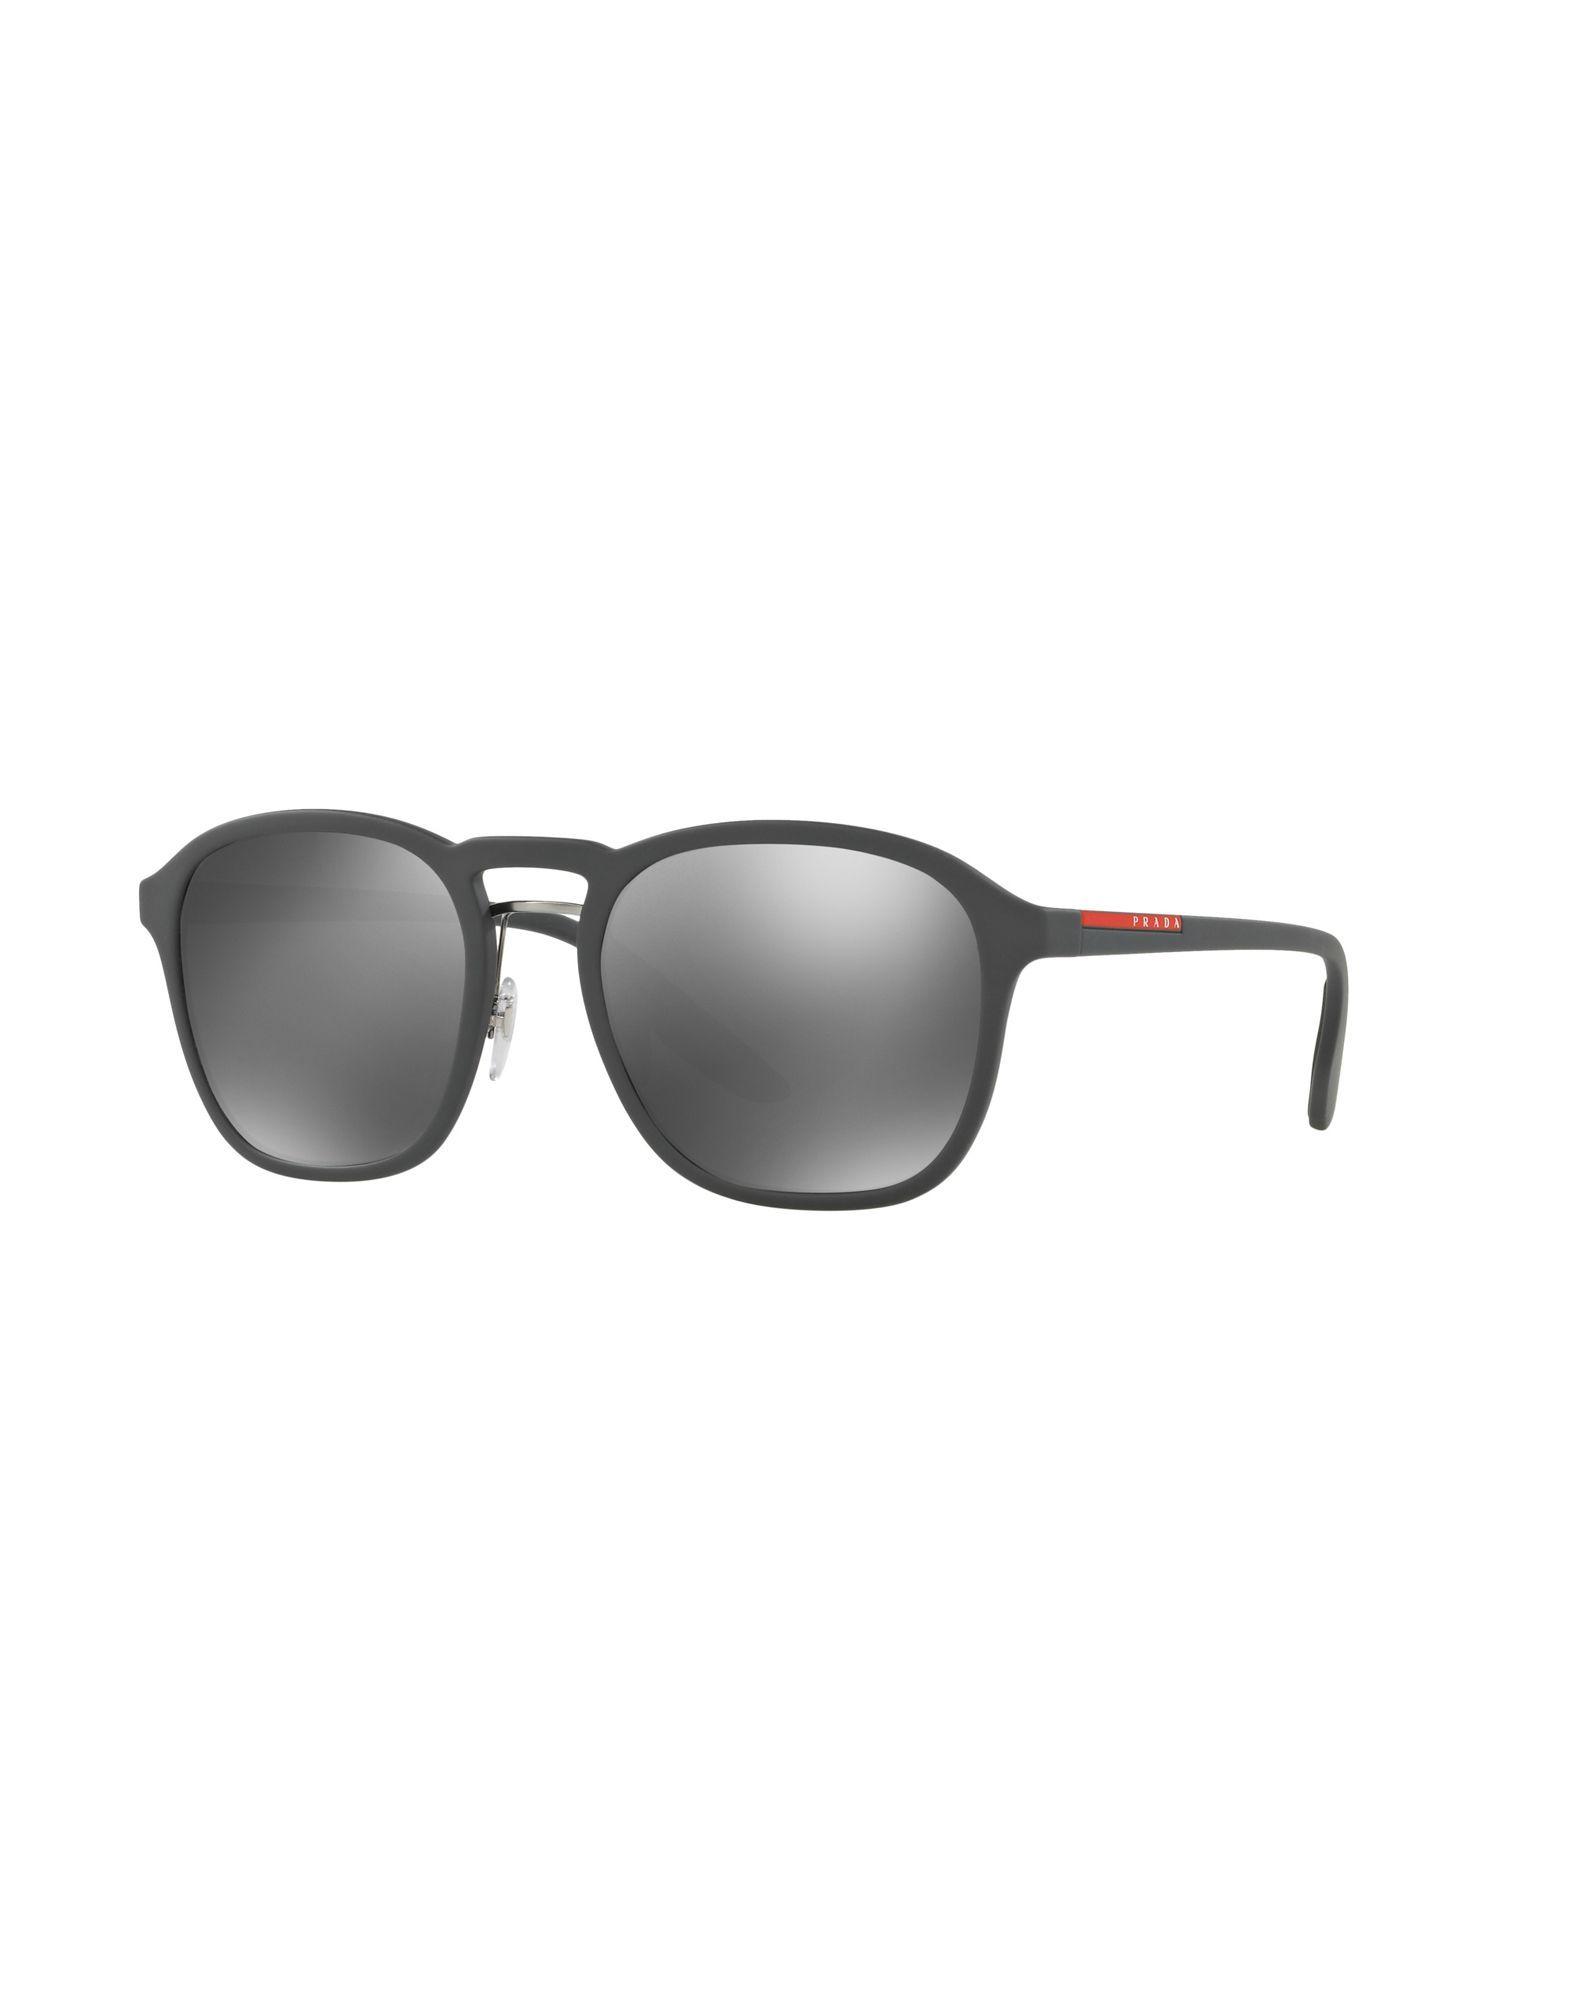 420d2b14de Michael Kors Sunglasses Zanzibar MK5001 109725 Gold and Turquoise Teal  Mirror